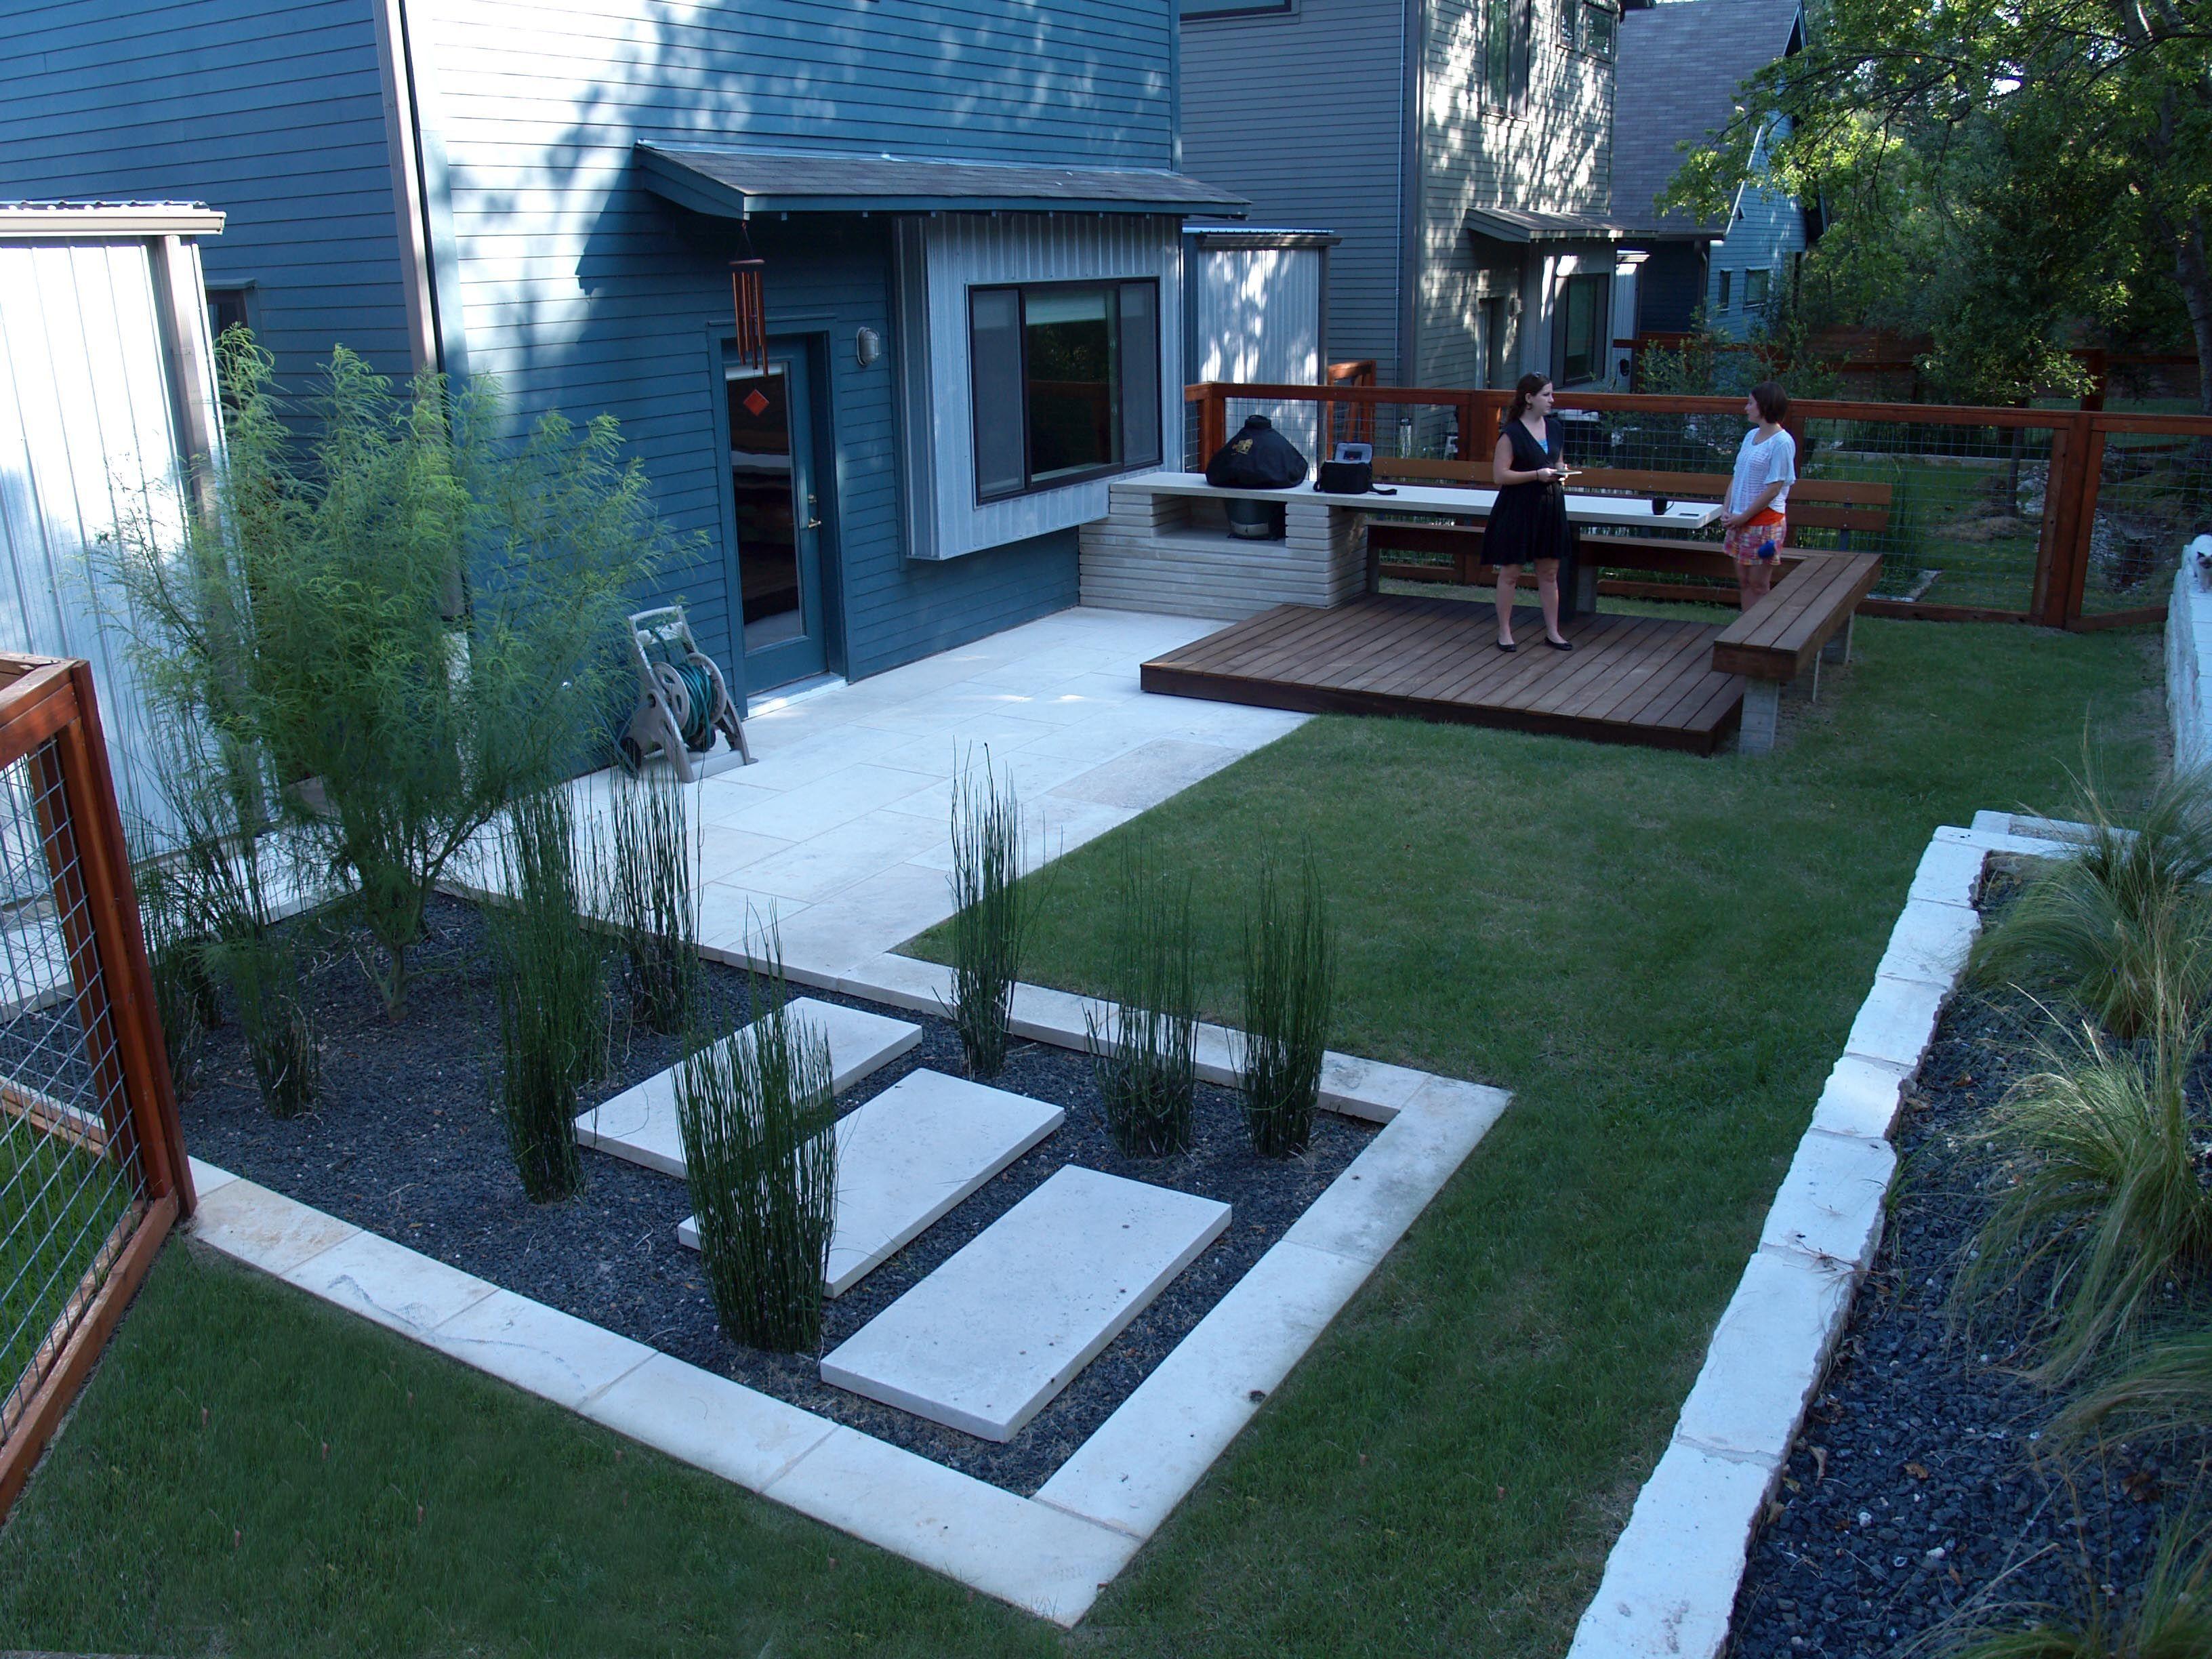 mesmerizing modern landscaping ideas for small backyards pics design rh za pinterest com